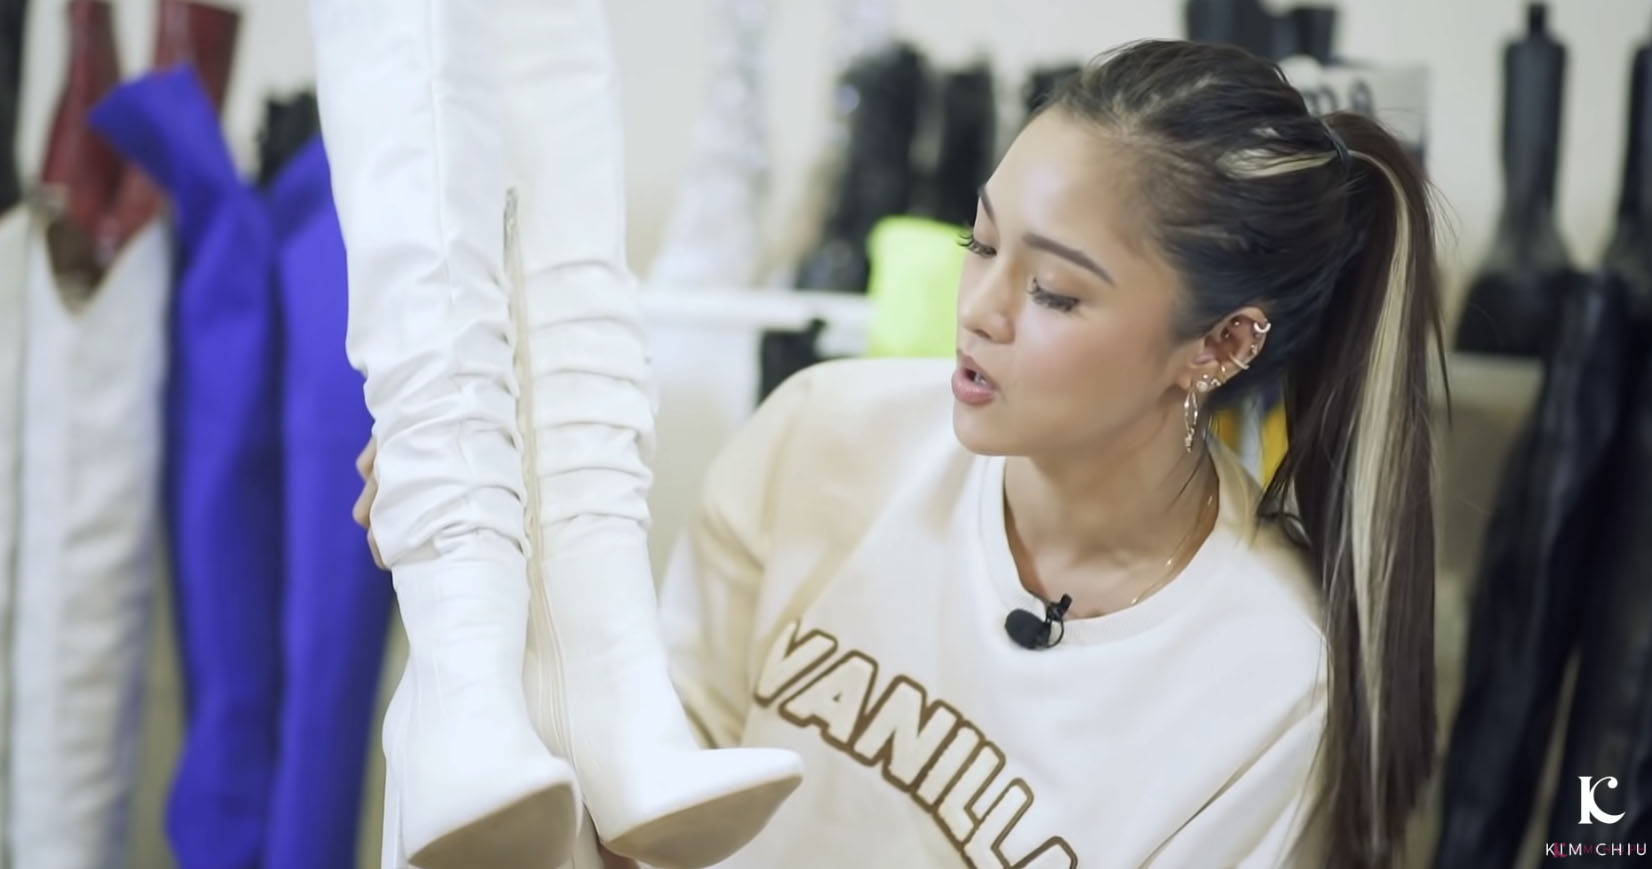 Youtube Vlog Screengrab: Kim Chiu white boots